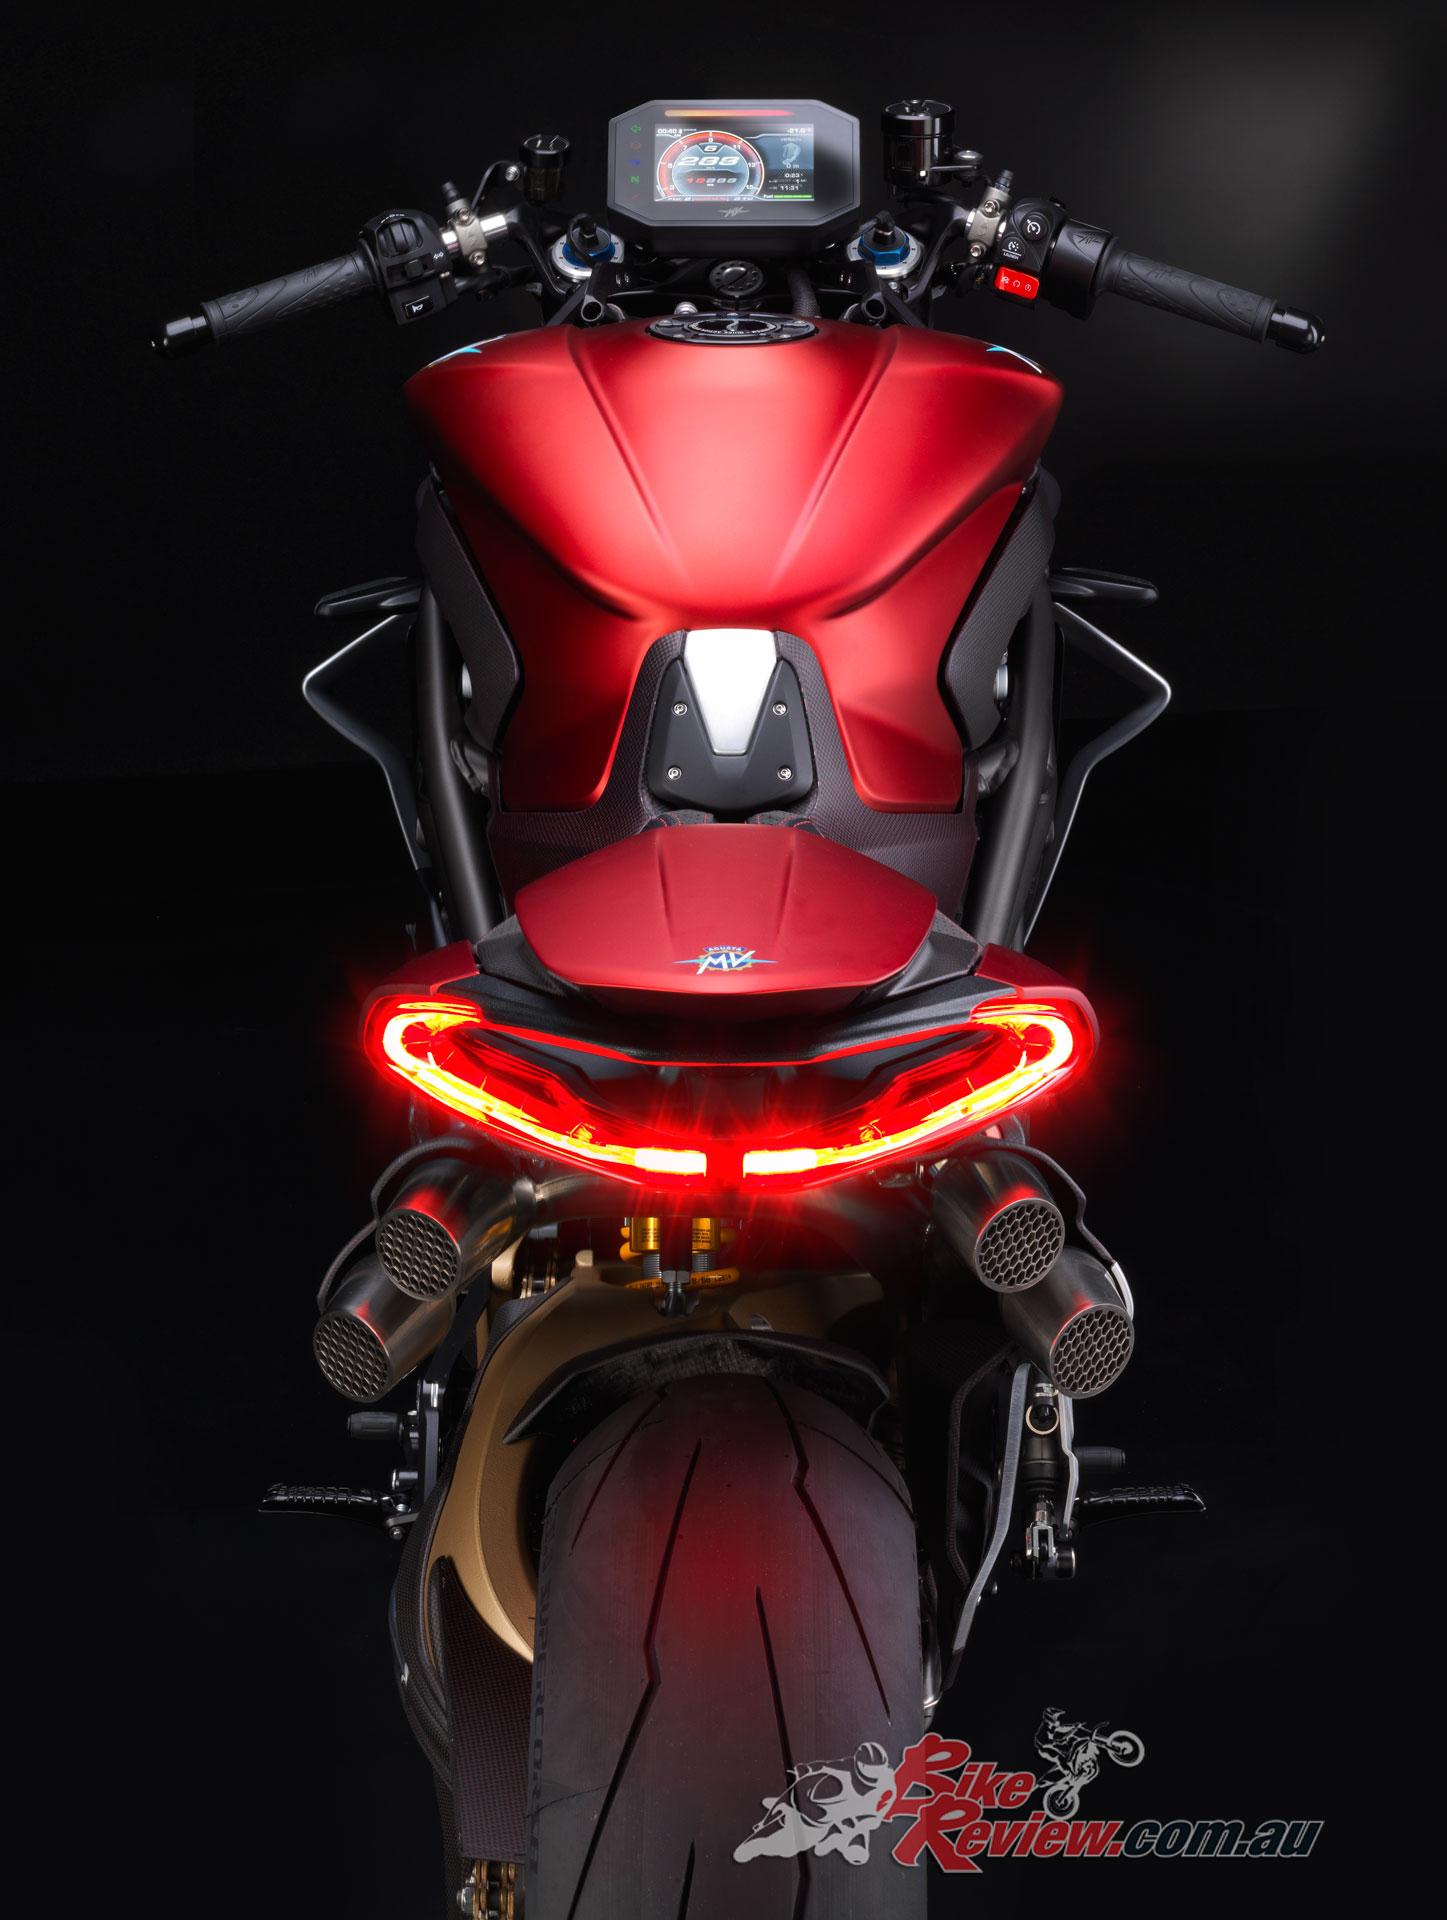 new model 2019 mv agusta brutale 1000 serie oro bike review. Black Bedroom Furniture Sets. Home Design Ideas